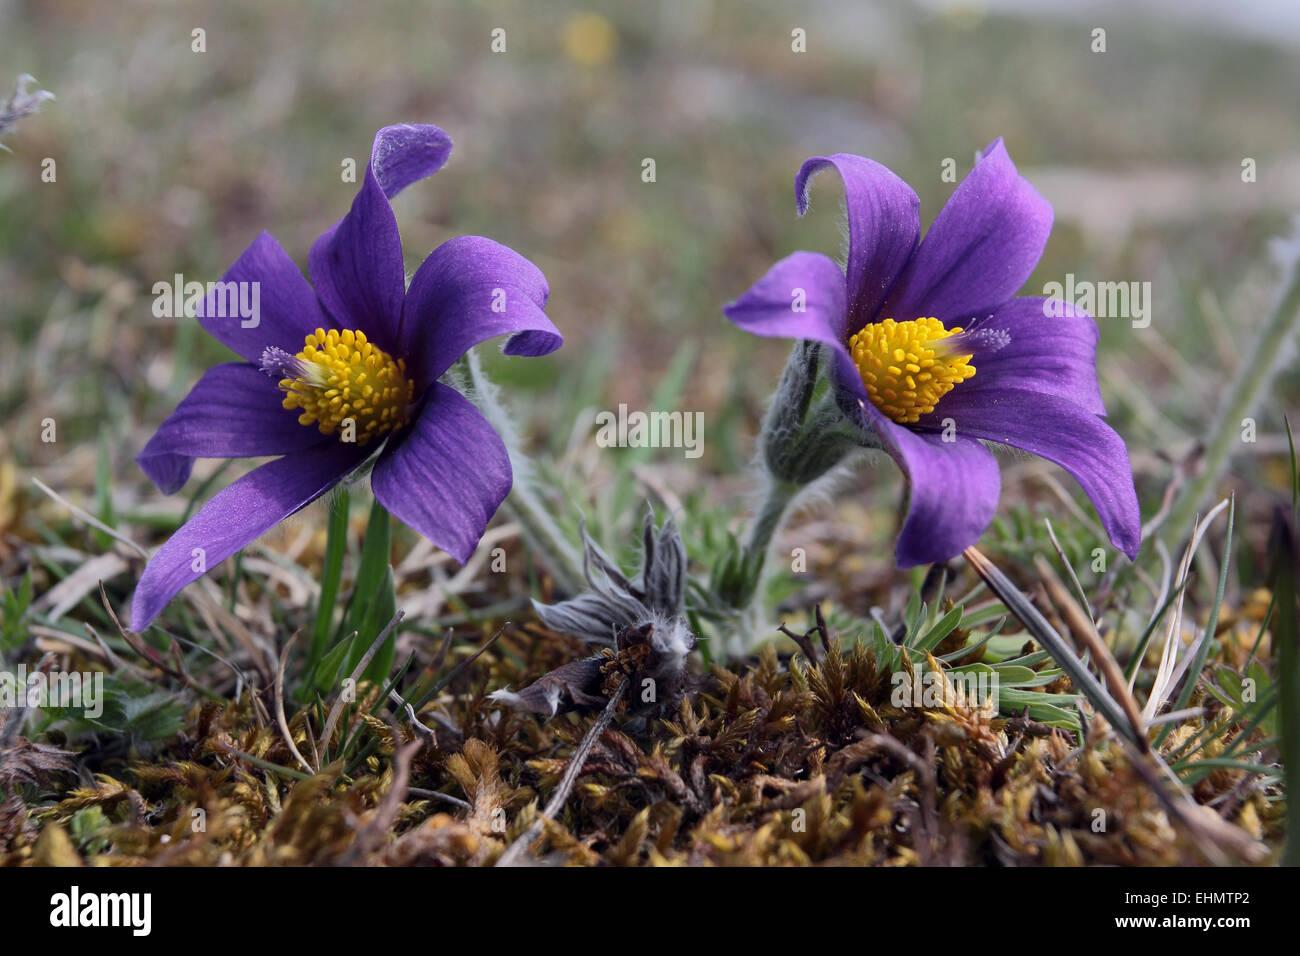 Pulsatilla vulgaris, Pasque flower - Stock Image